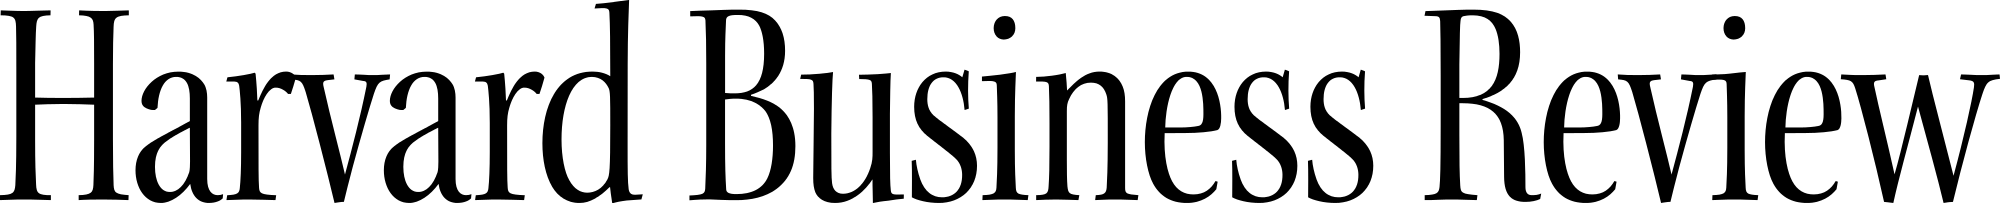 Logo of Harvard Business Review - danarmustafa.wordpress.com